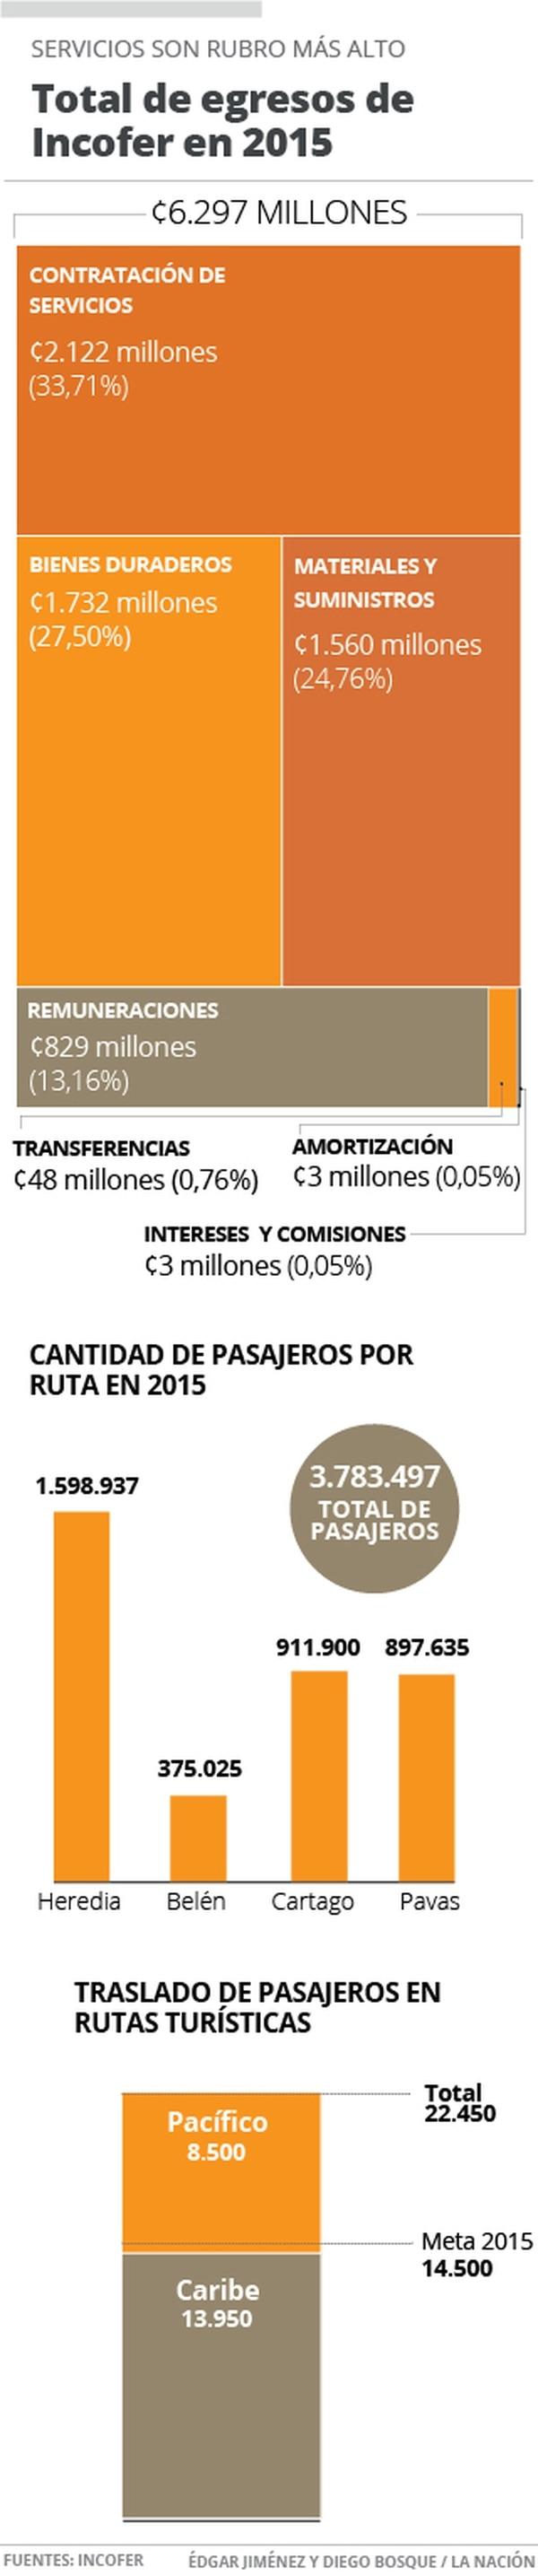 Total de egresos de Incofer en 2015